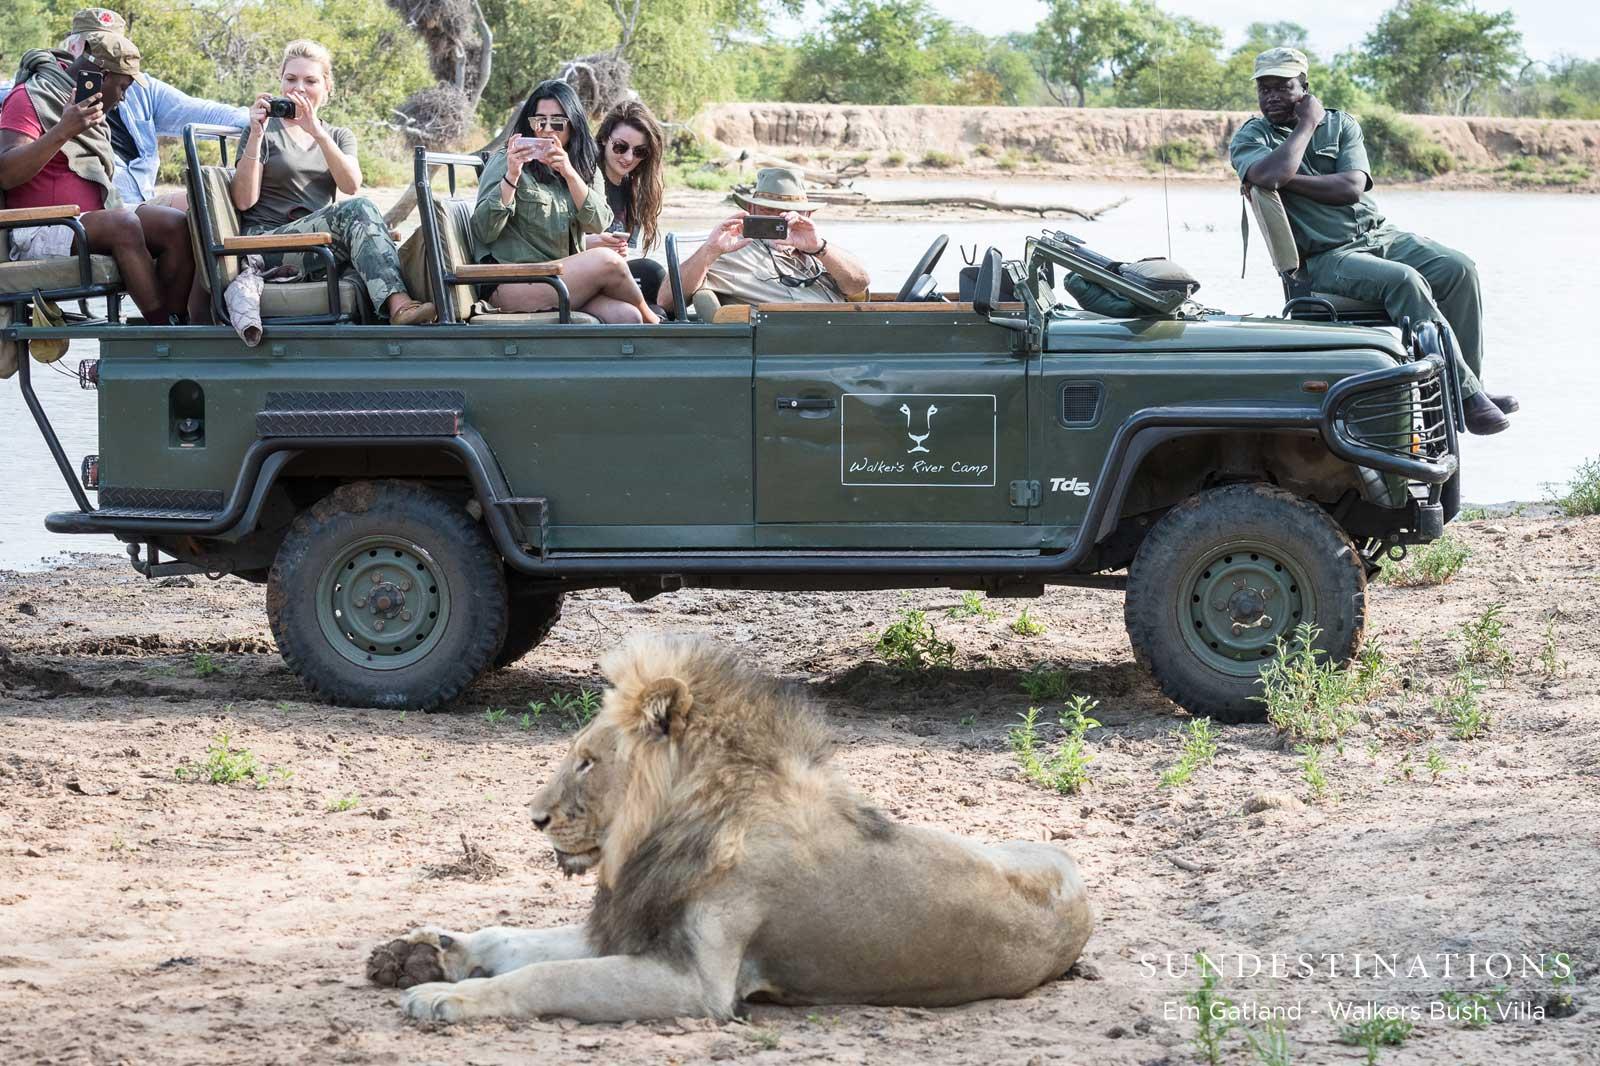 Lions - Mbiri Male Lions